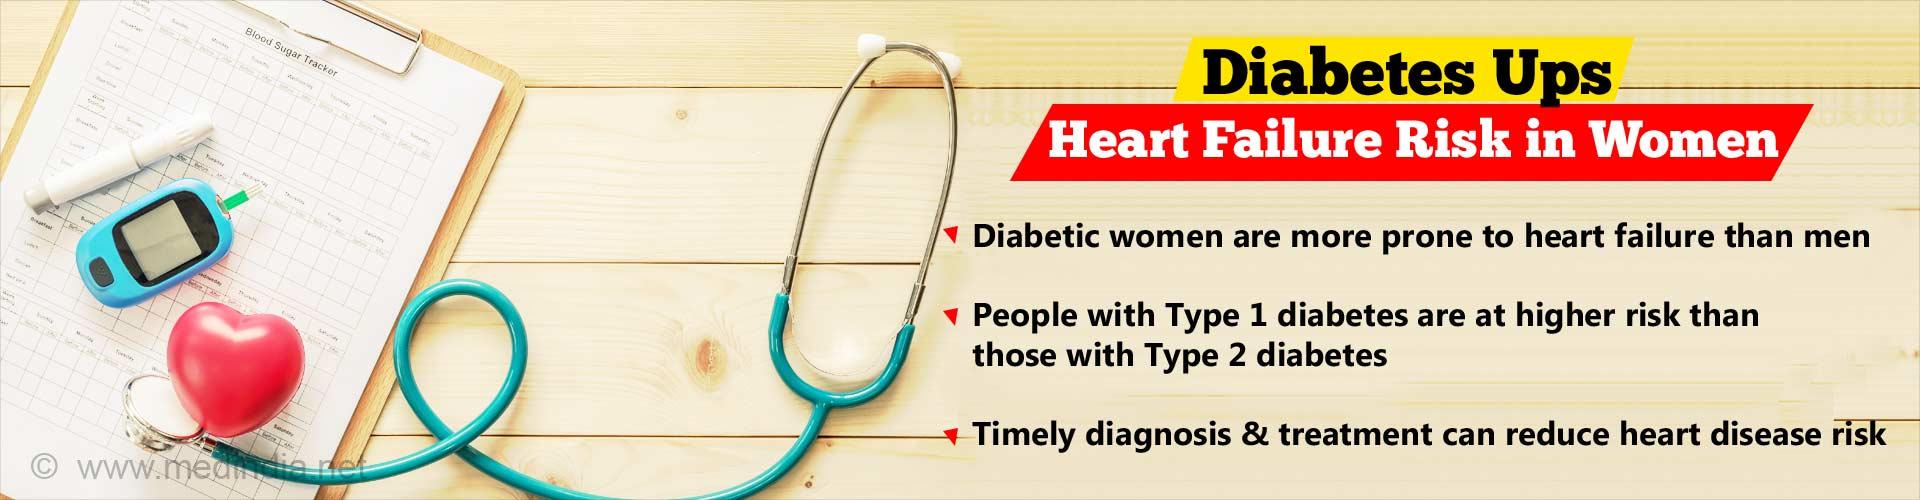 Diabetes Puts Women at Greater Risk of Heart Failure Than Men